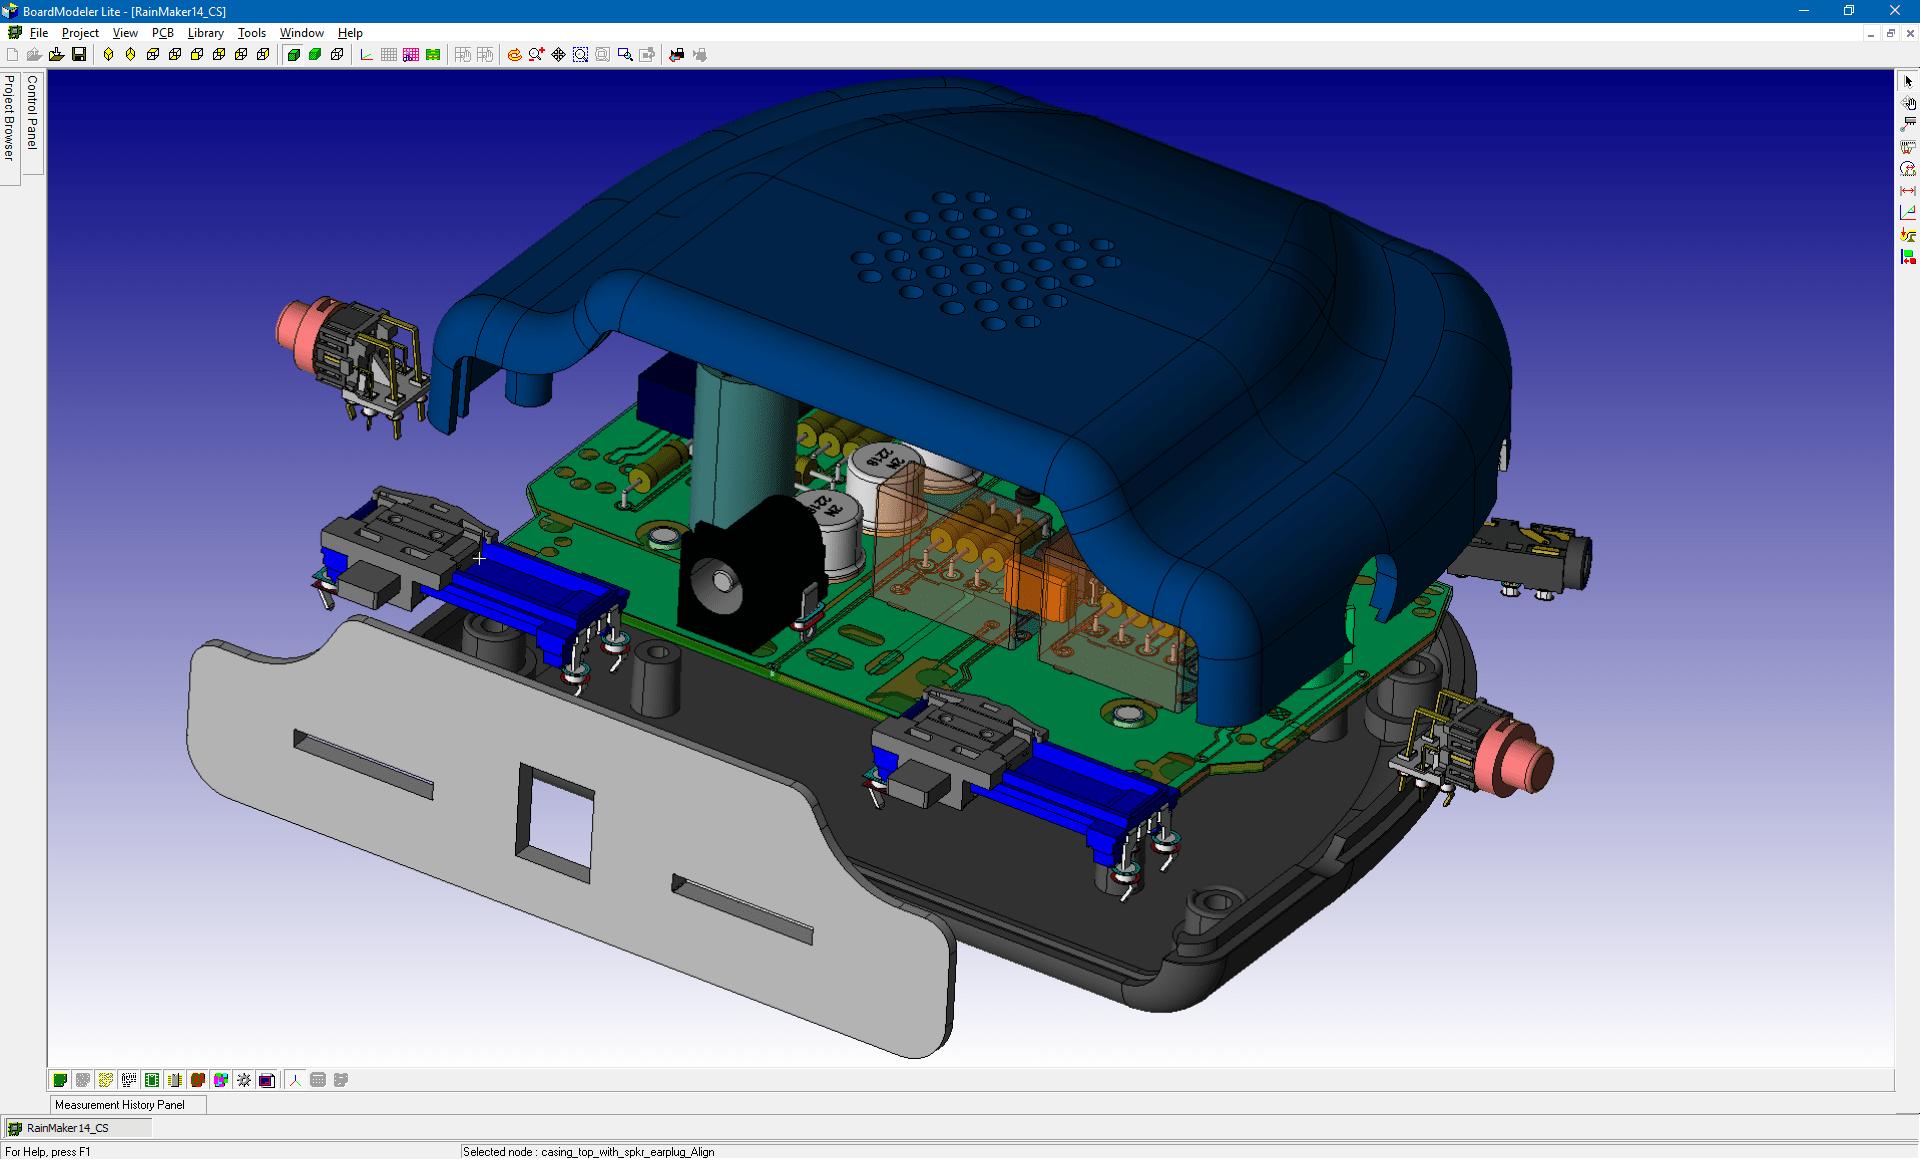 Professional 3d Pcb Design Software Cadstar Zuken Csk Electronic Circuit Tools Promotion Professsional Board Modeler Lite Explosive View